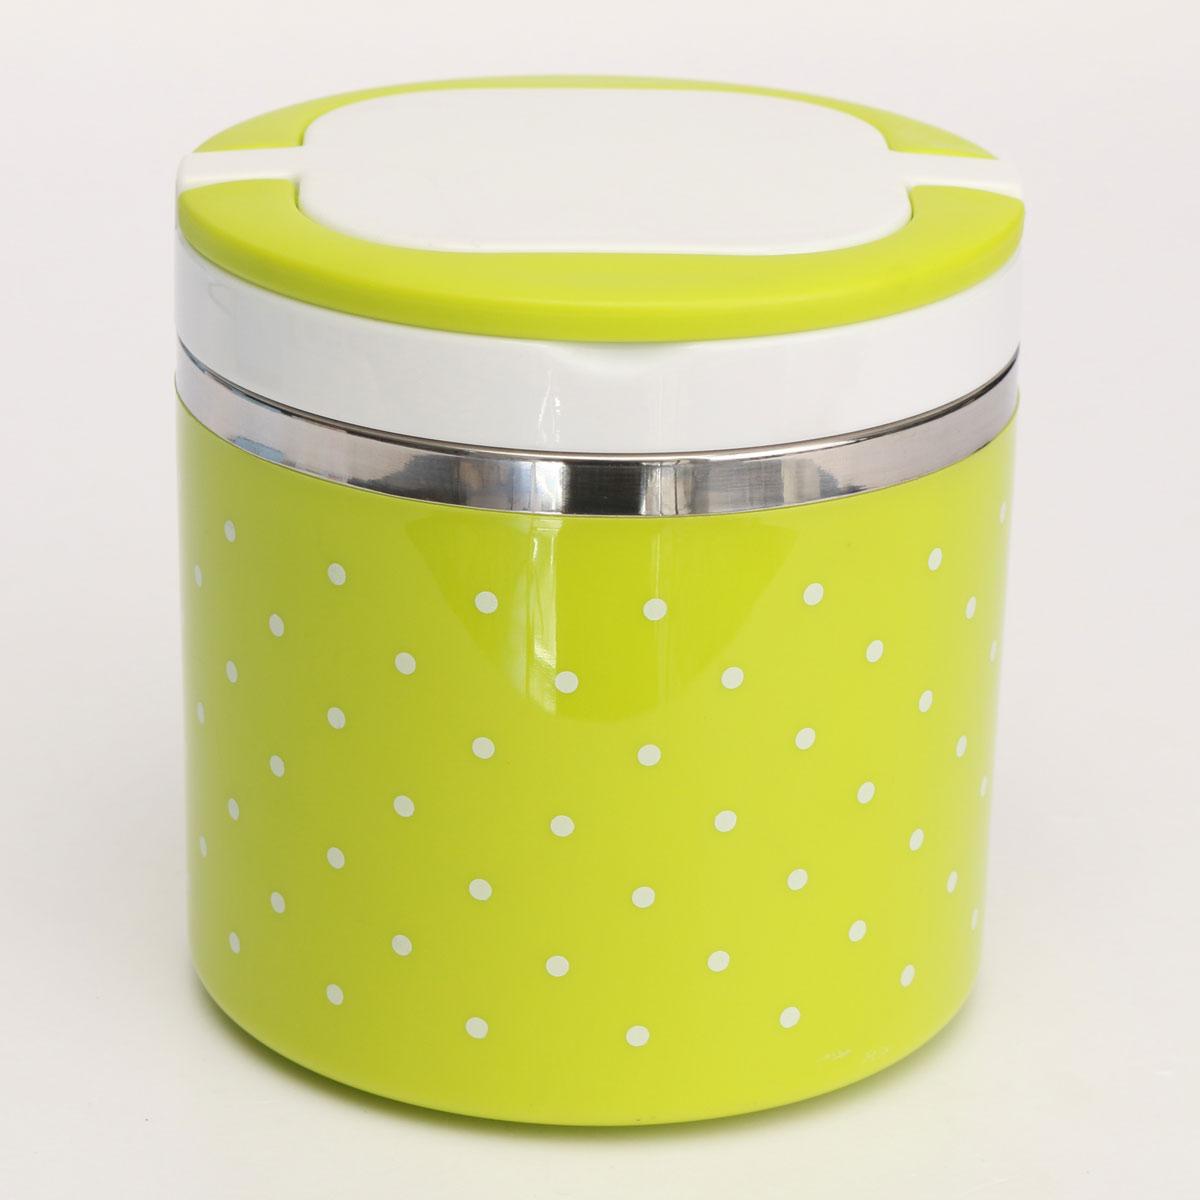 1 3 compartiments bo te repas d jeuner soupe bento lunch box inox portable uk ebay. Black Bedroom Furniture Sets. Home Design Ideas